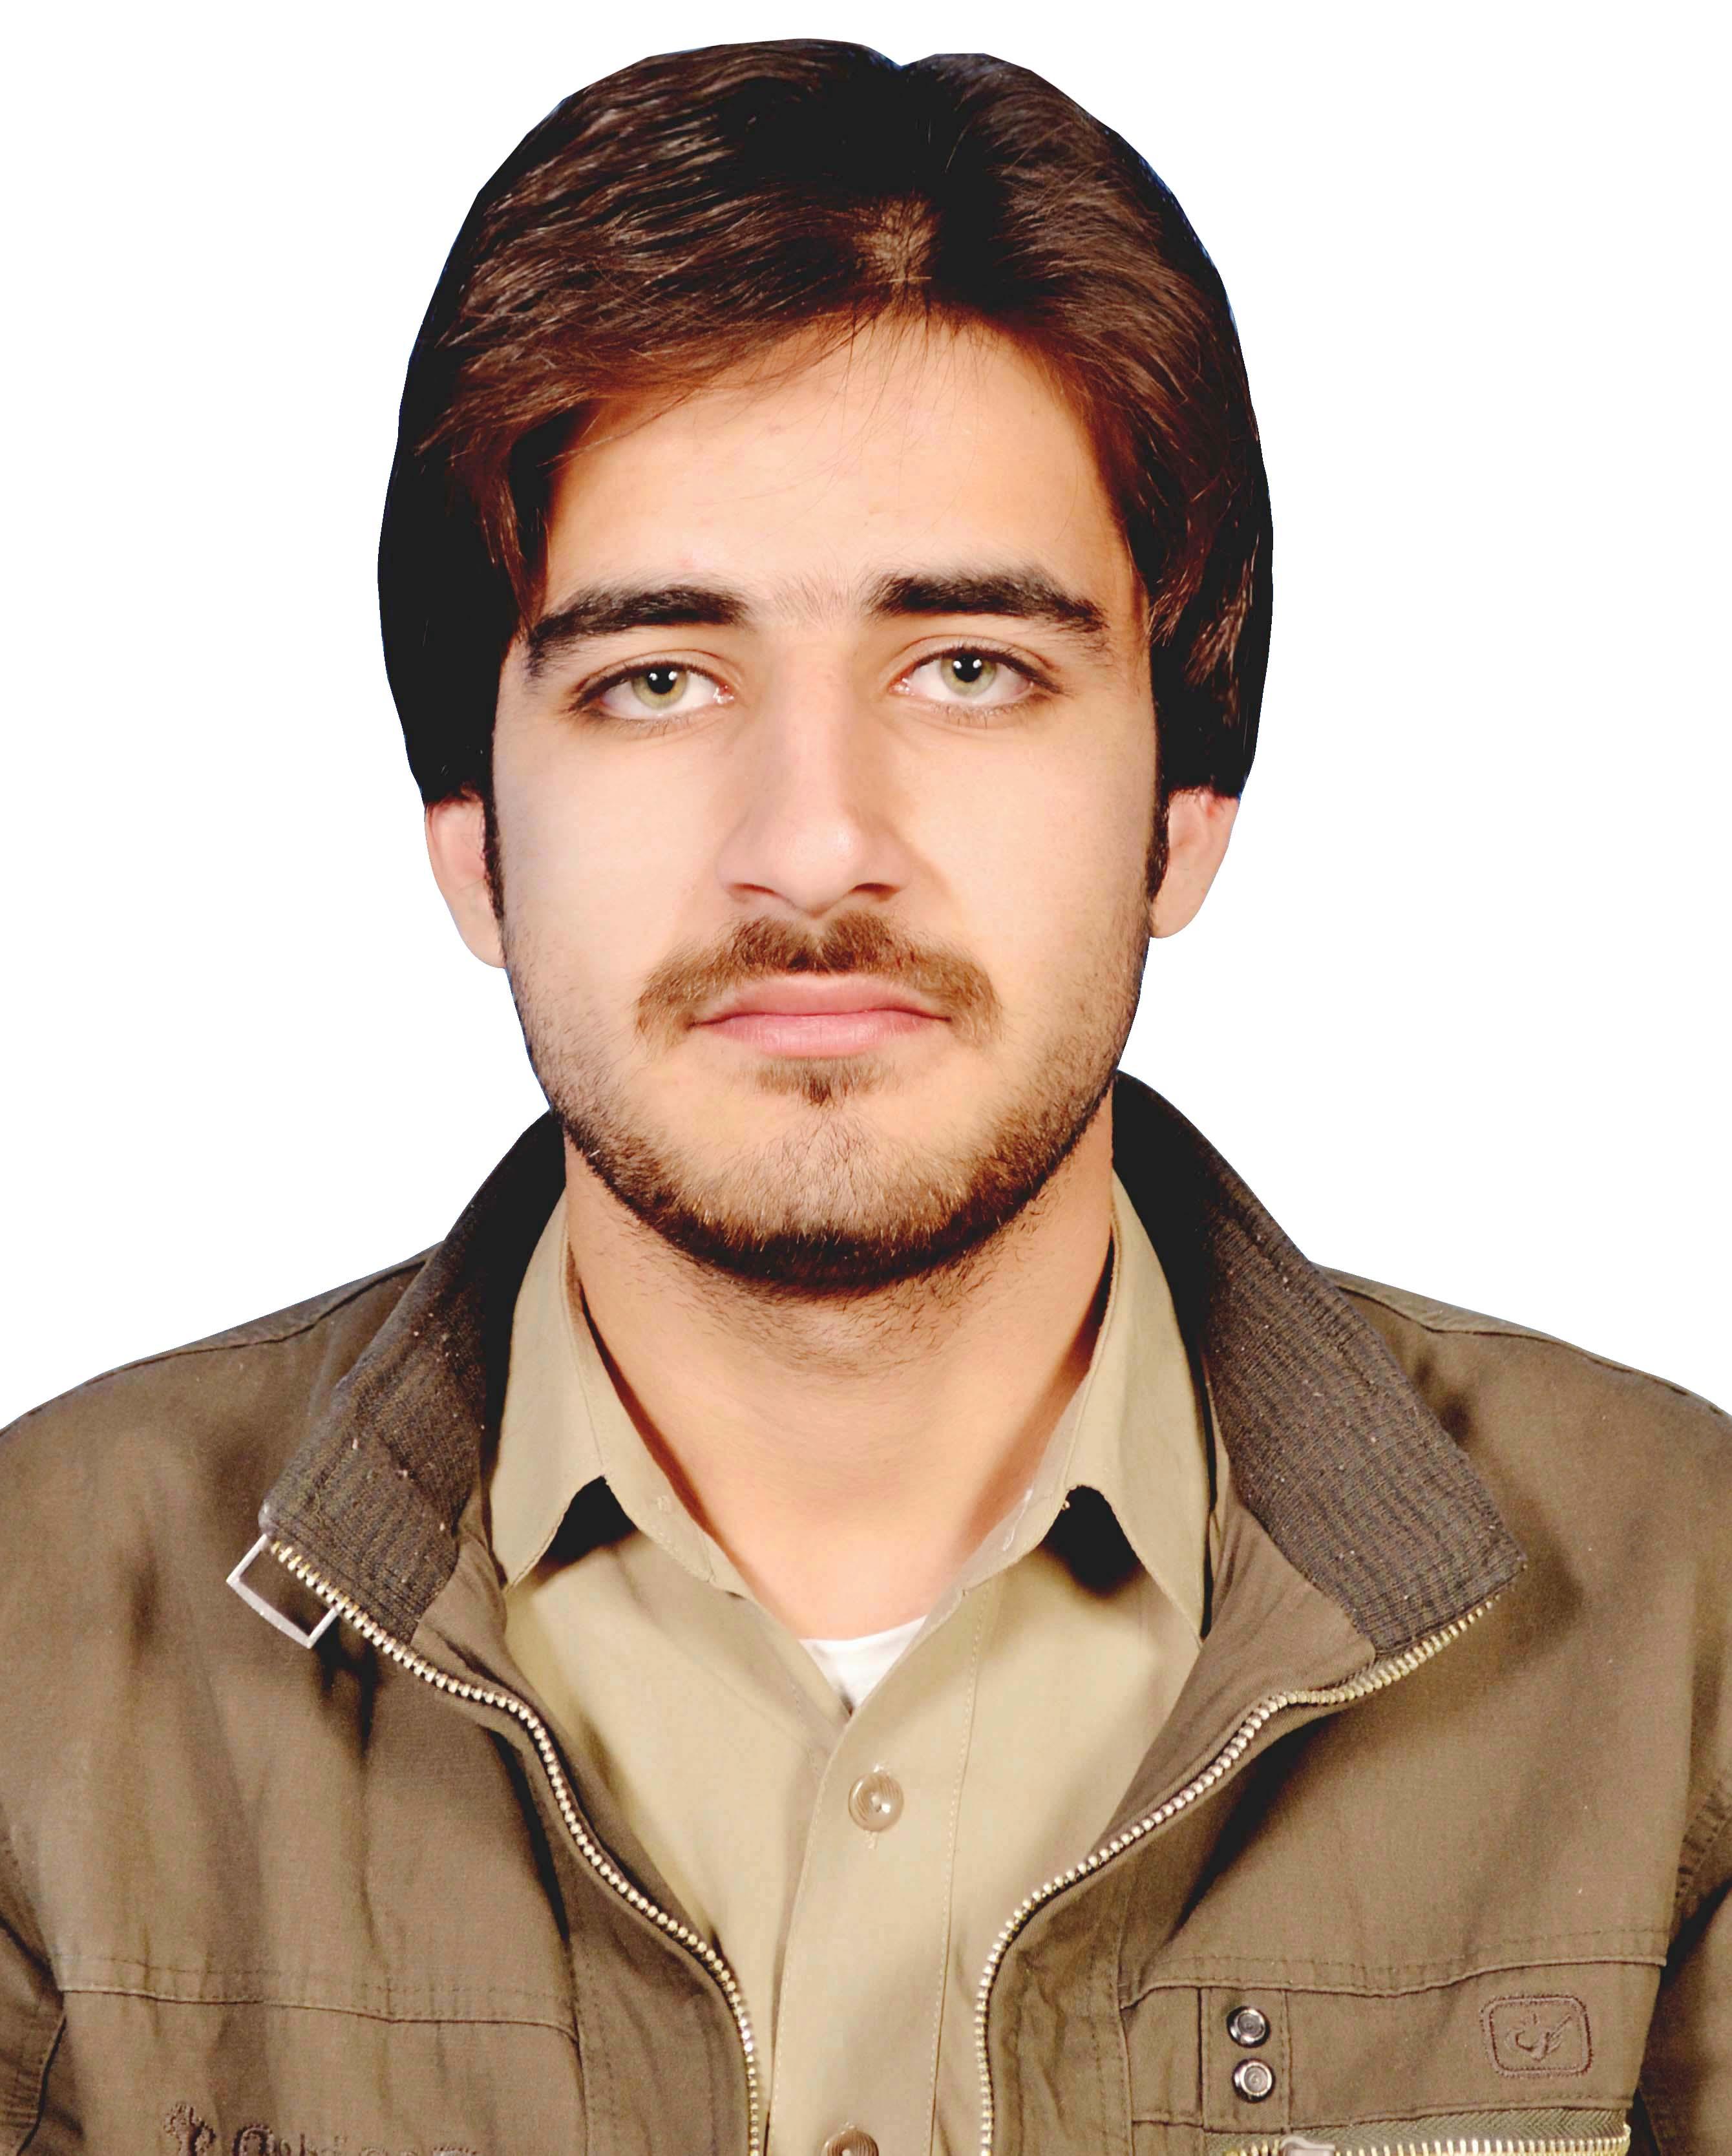 Sajid Khan Photo Editing